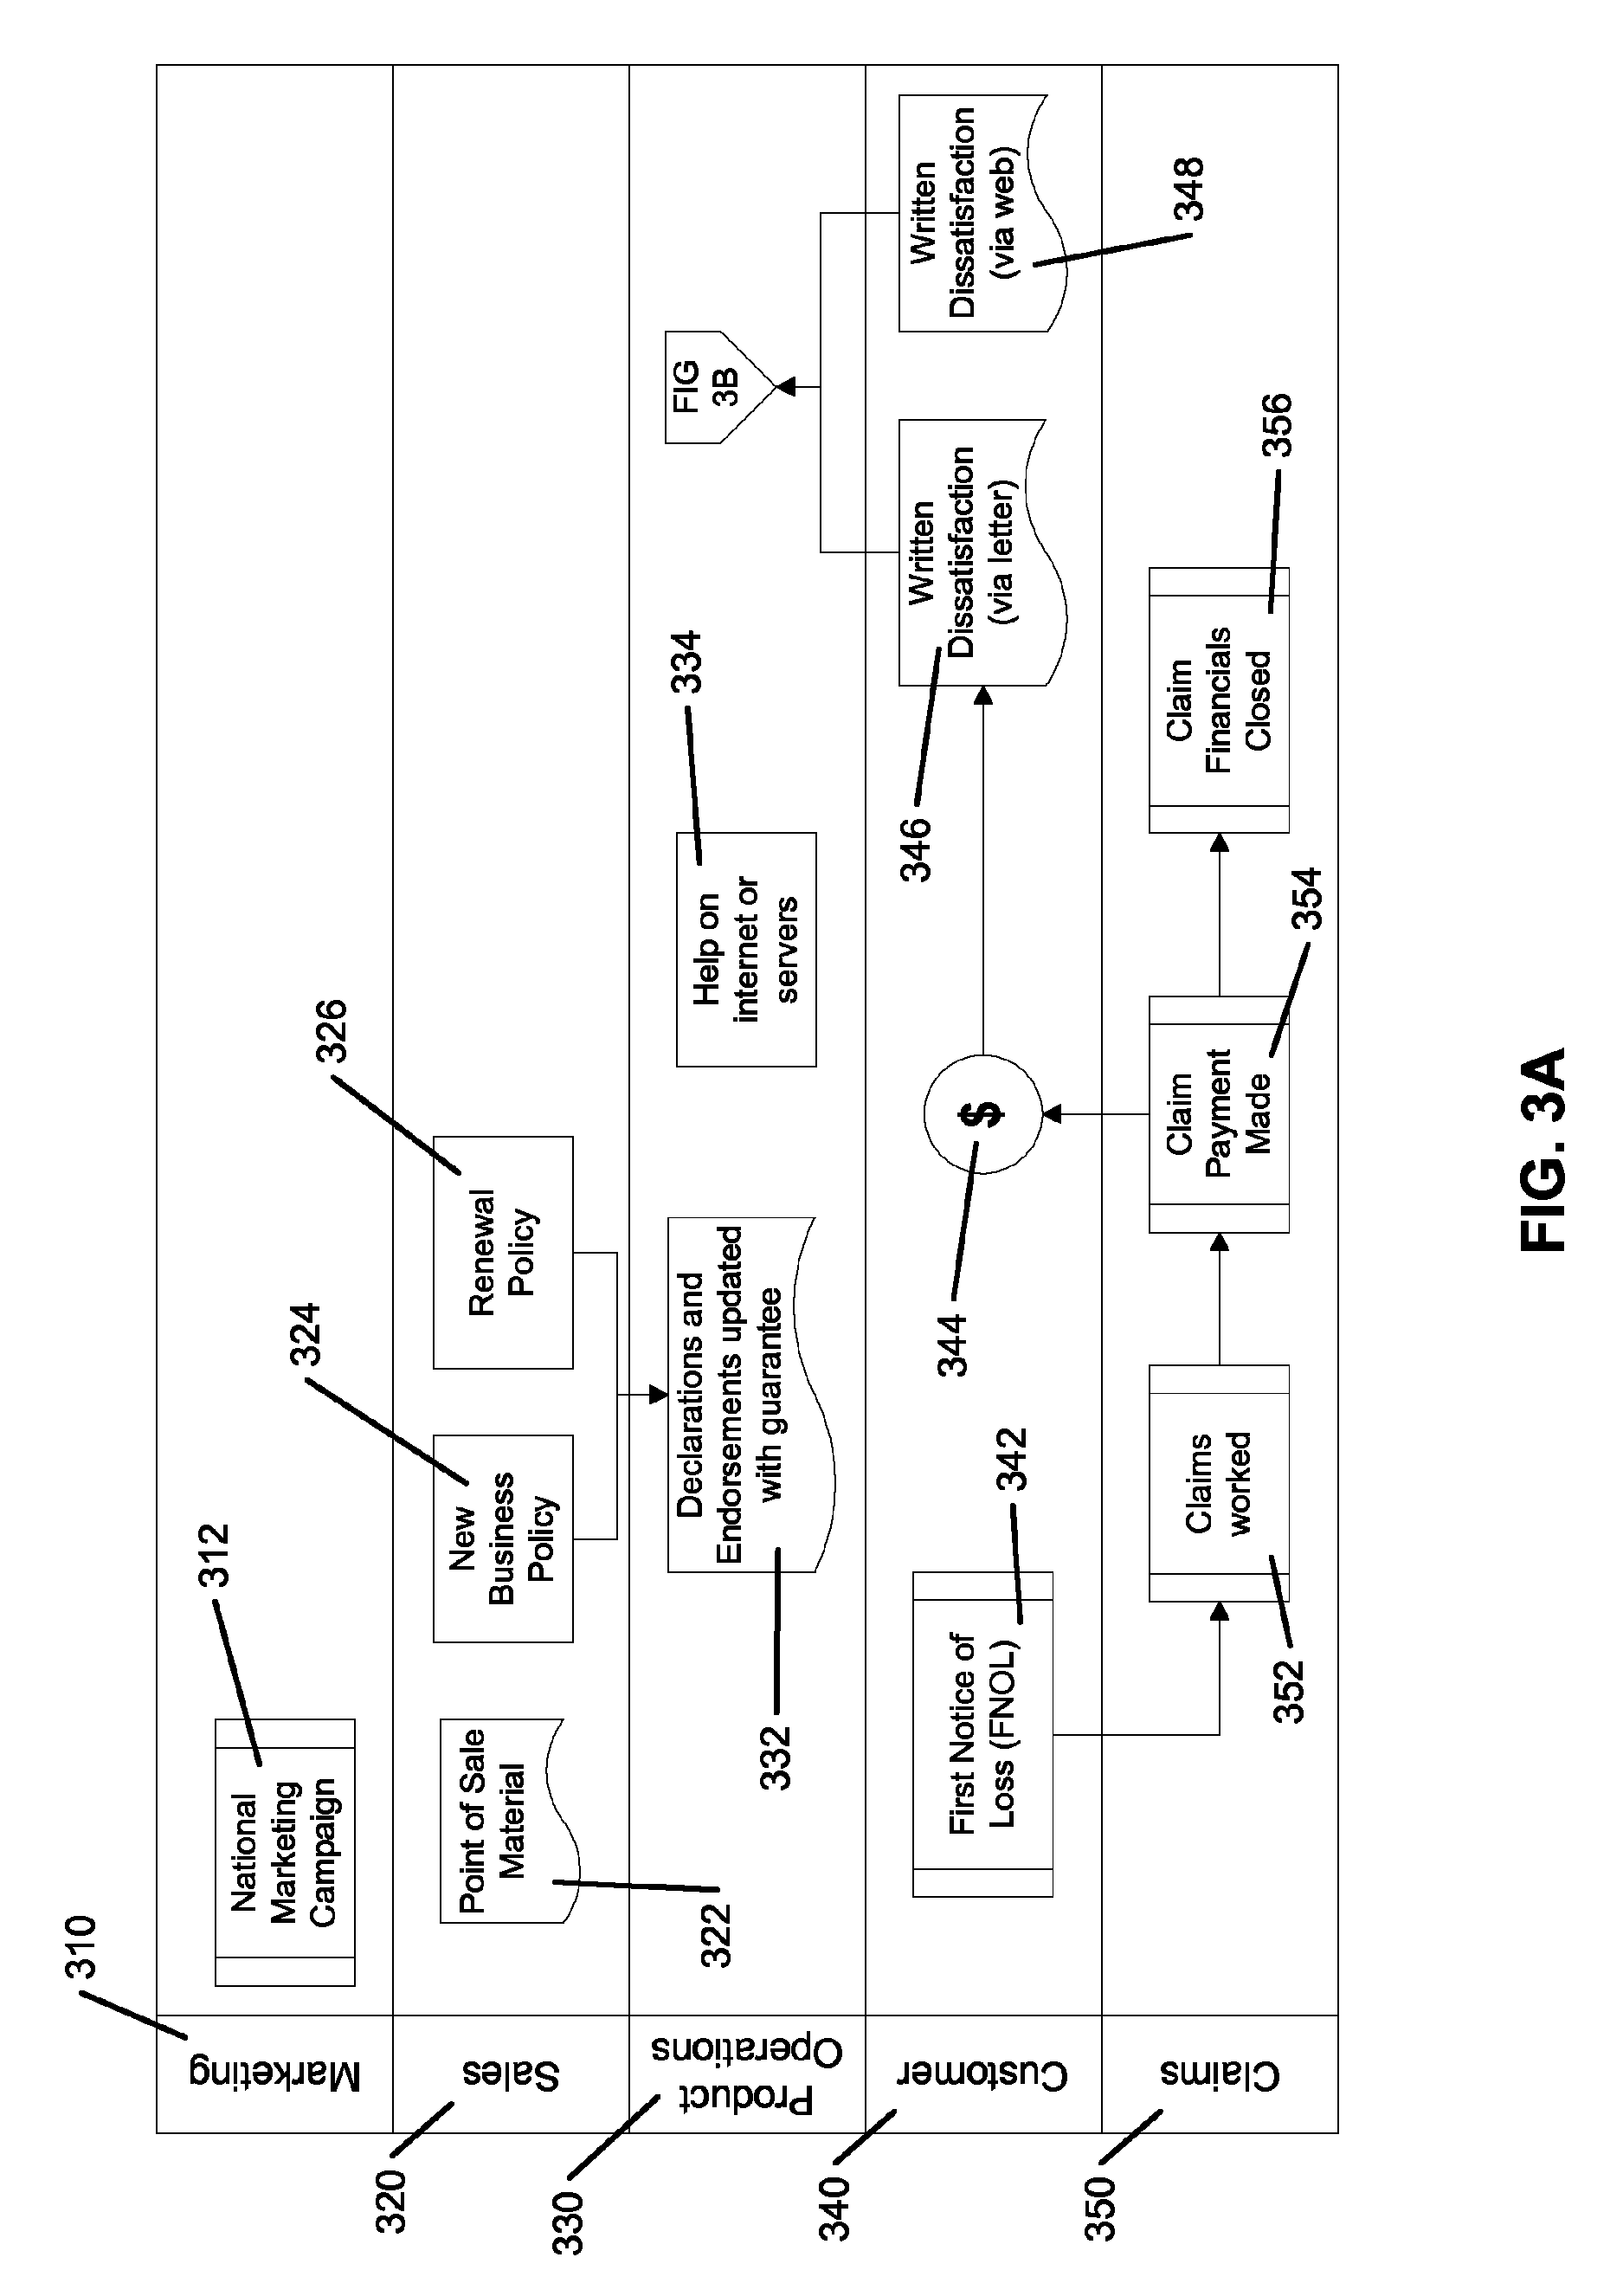 Patent Us8688482 Claim Satisfaction Guarantee Google Patents